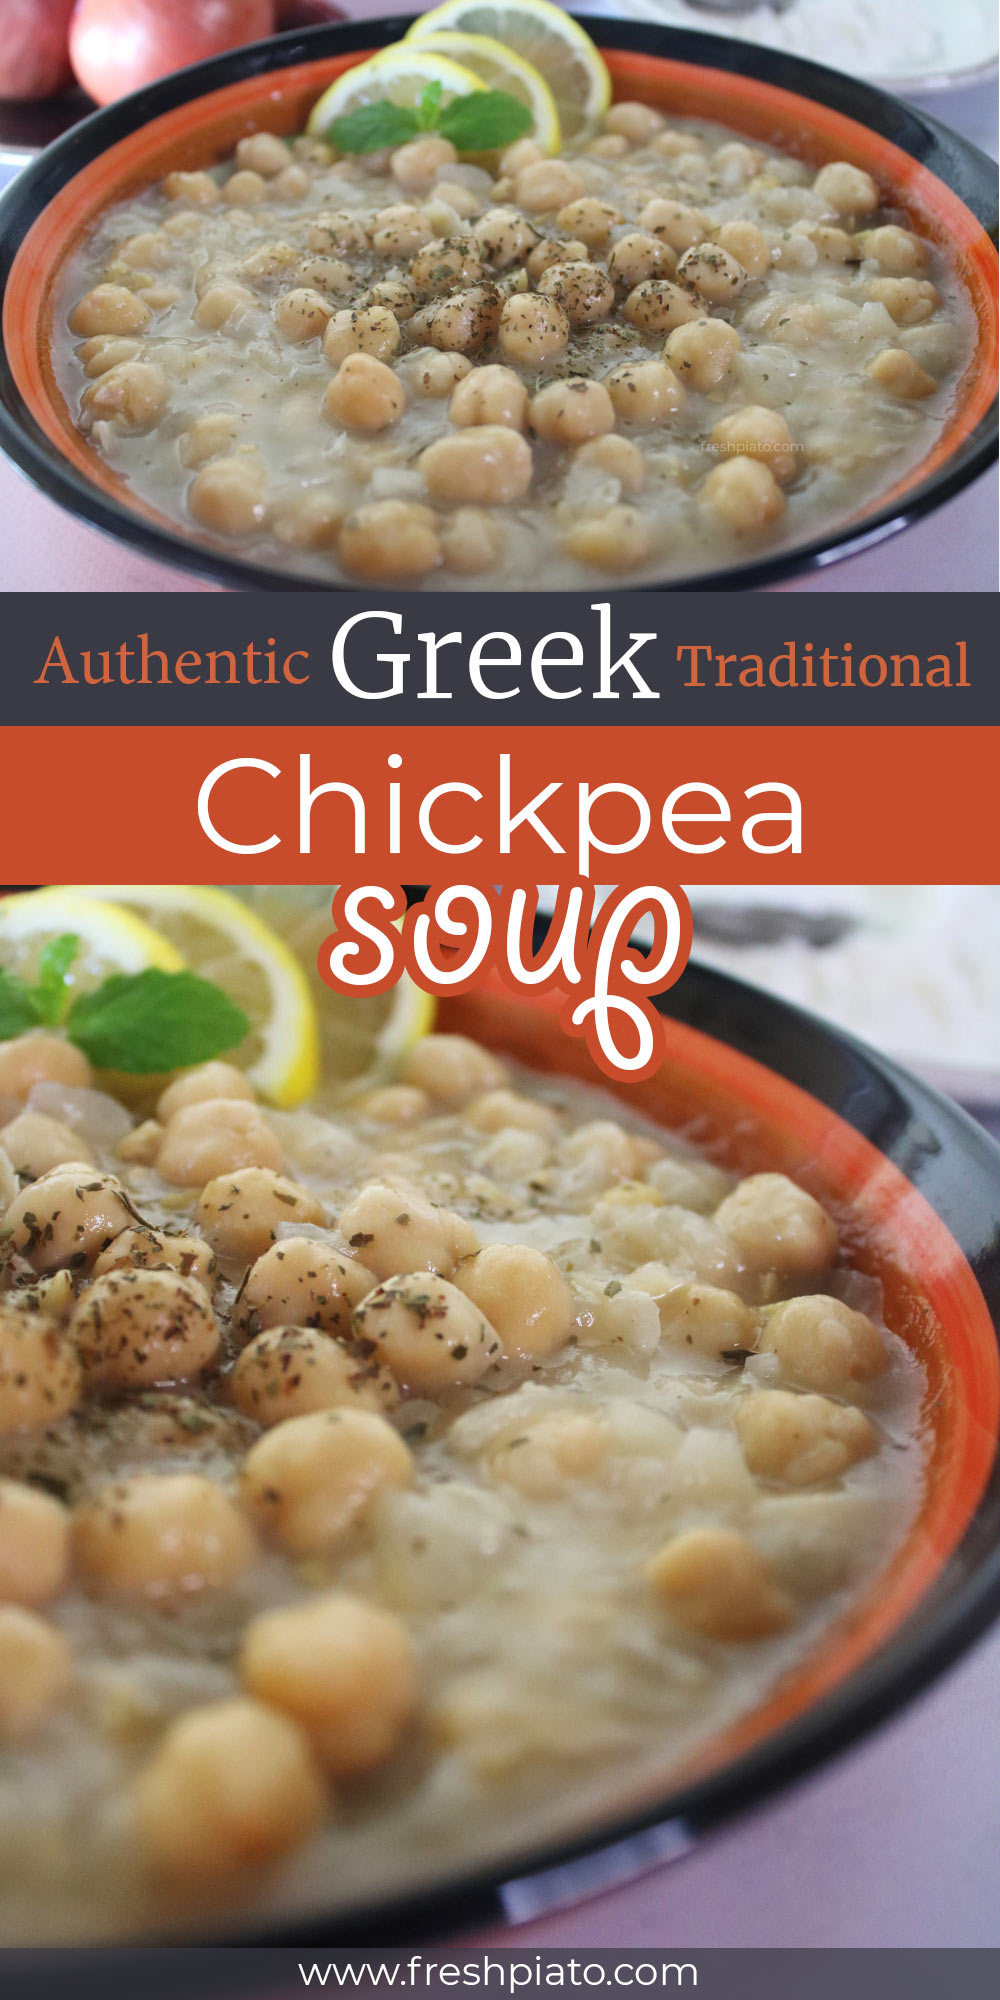 Chickpea soup recipe pin